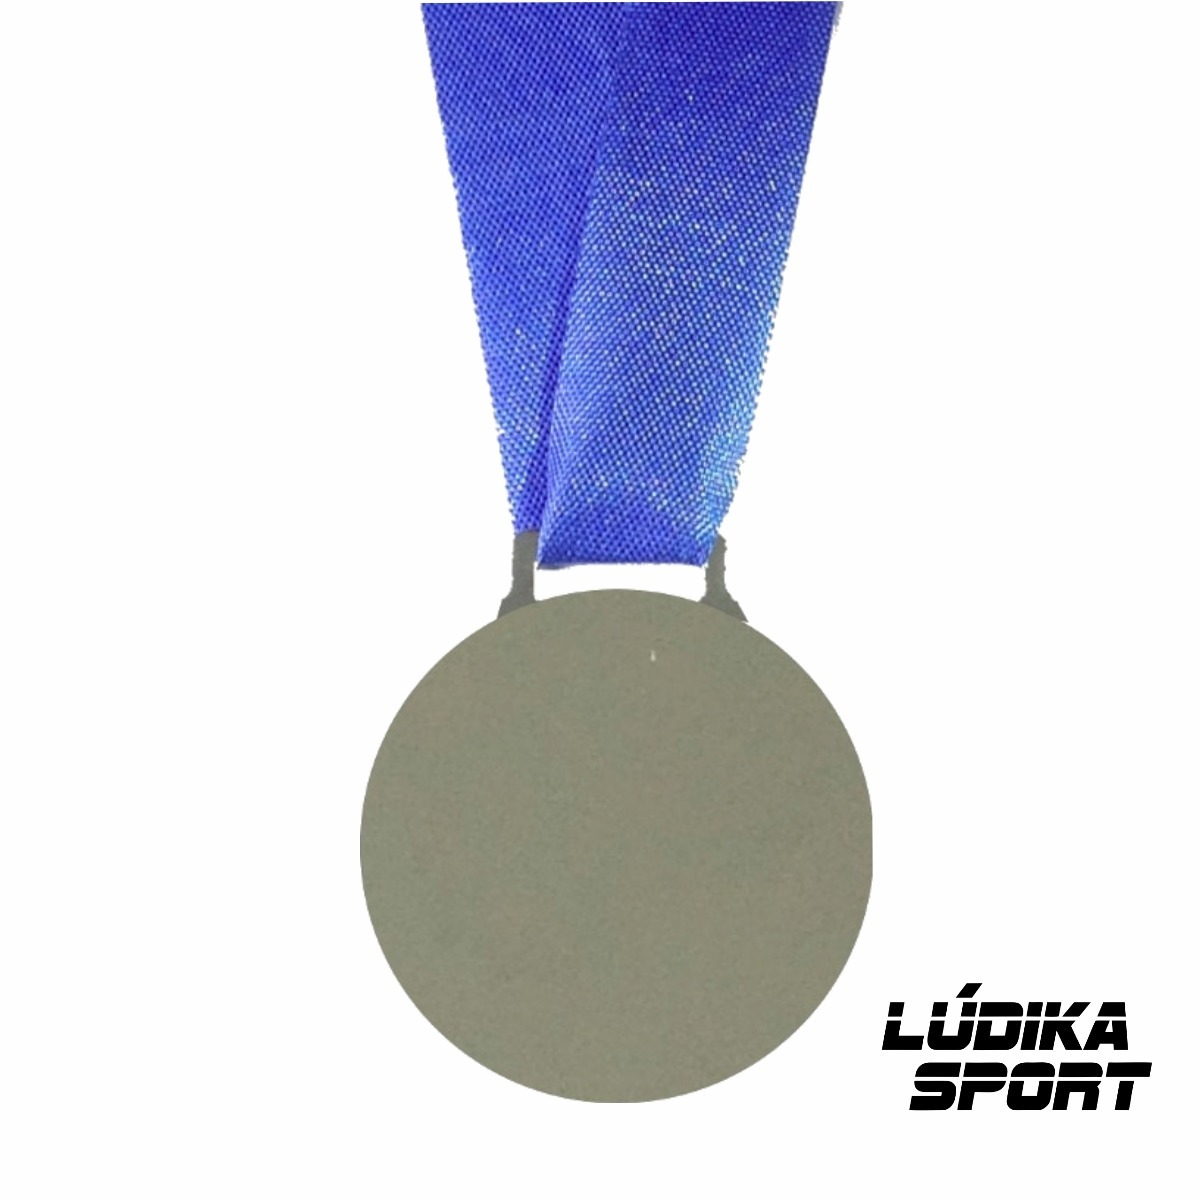 f9173d55aa05f A Medalha Em Metal + Barata Do Brasil! 6 Unidades - R  12